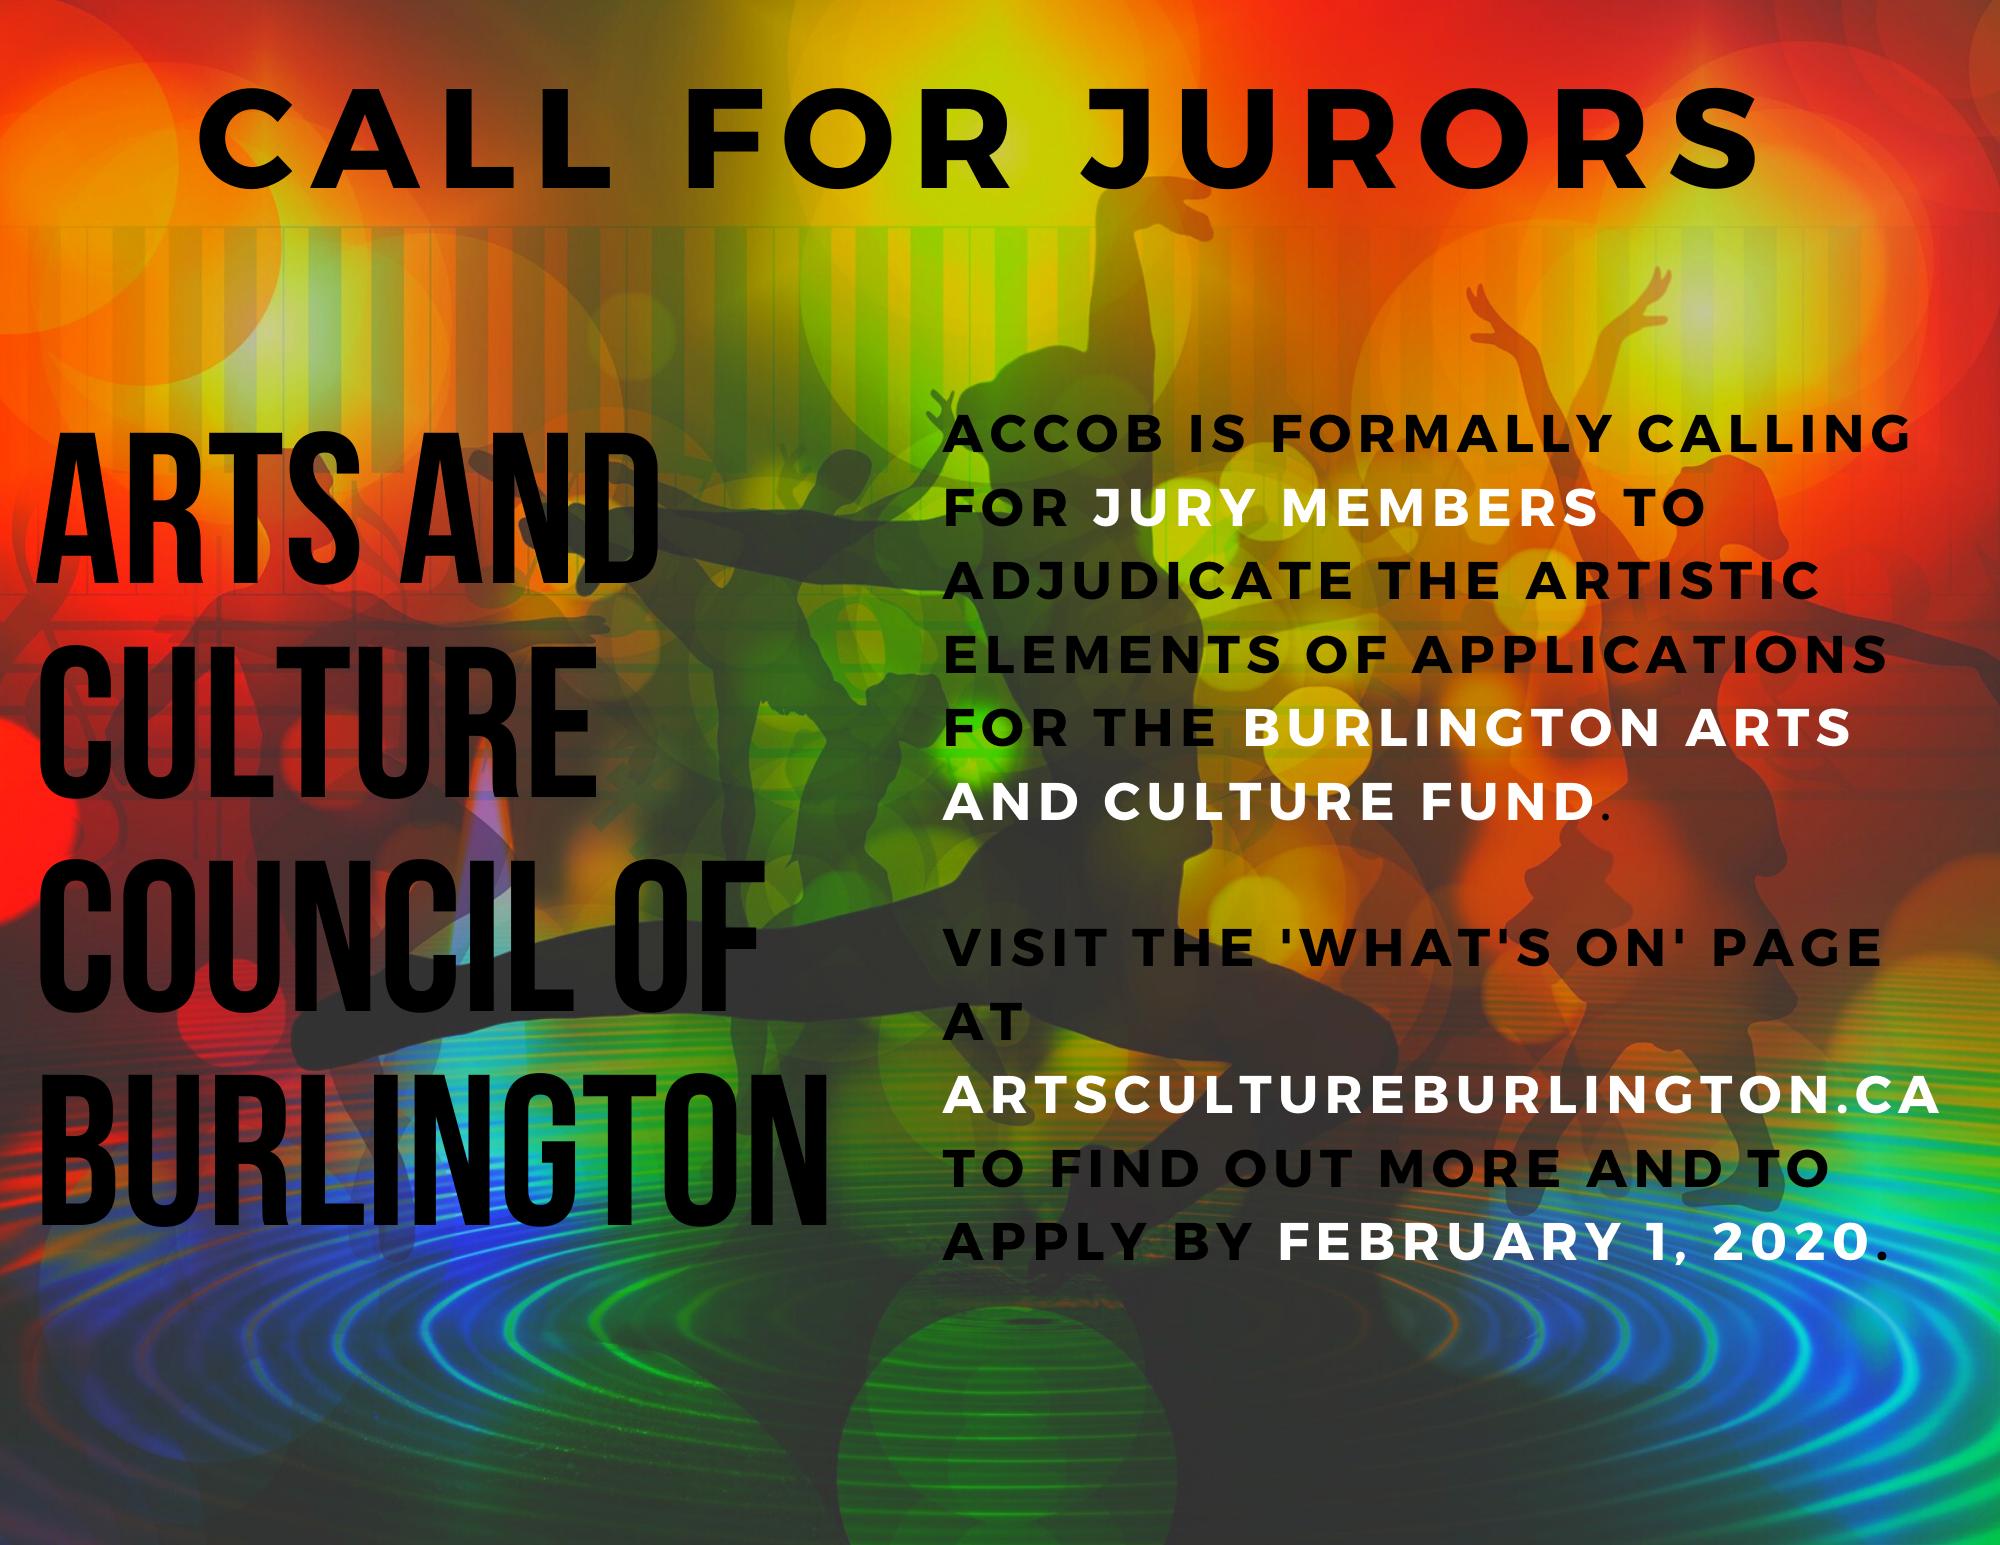 2020 ACCOB Call for Jurors